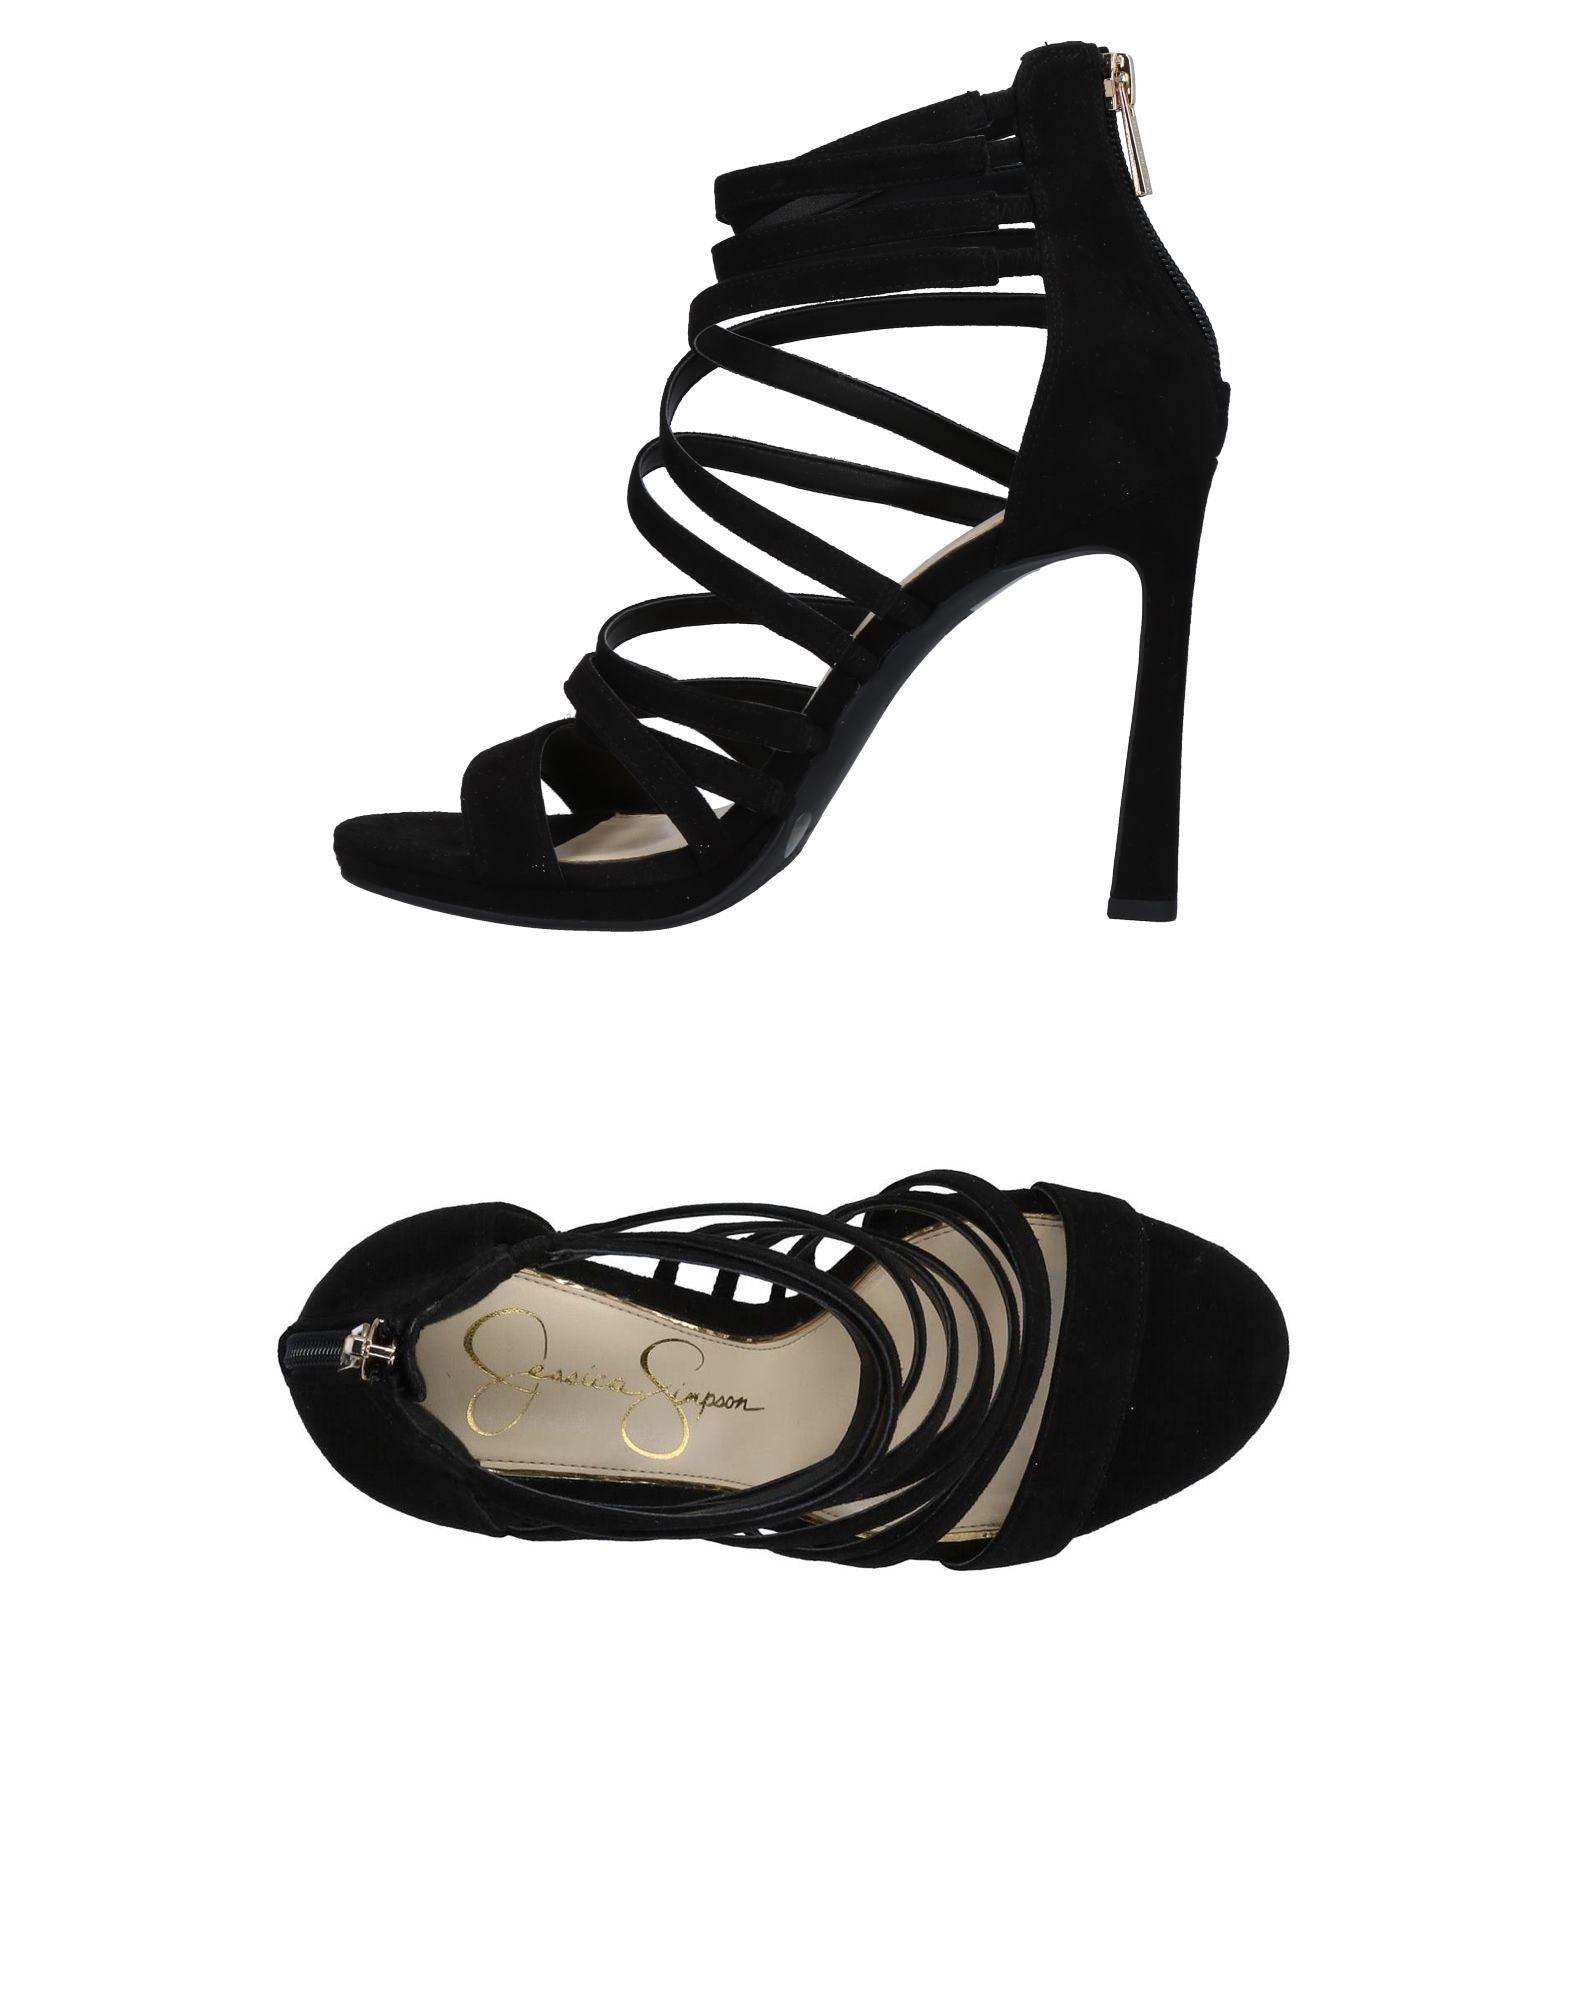 Jessica Simpson Sandalen Damen  11480198CH Gute Qualität beliebte Schuhe